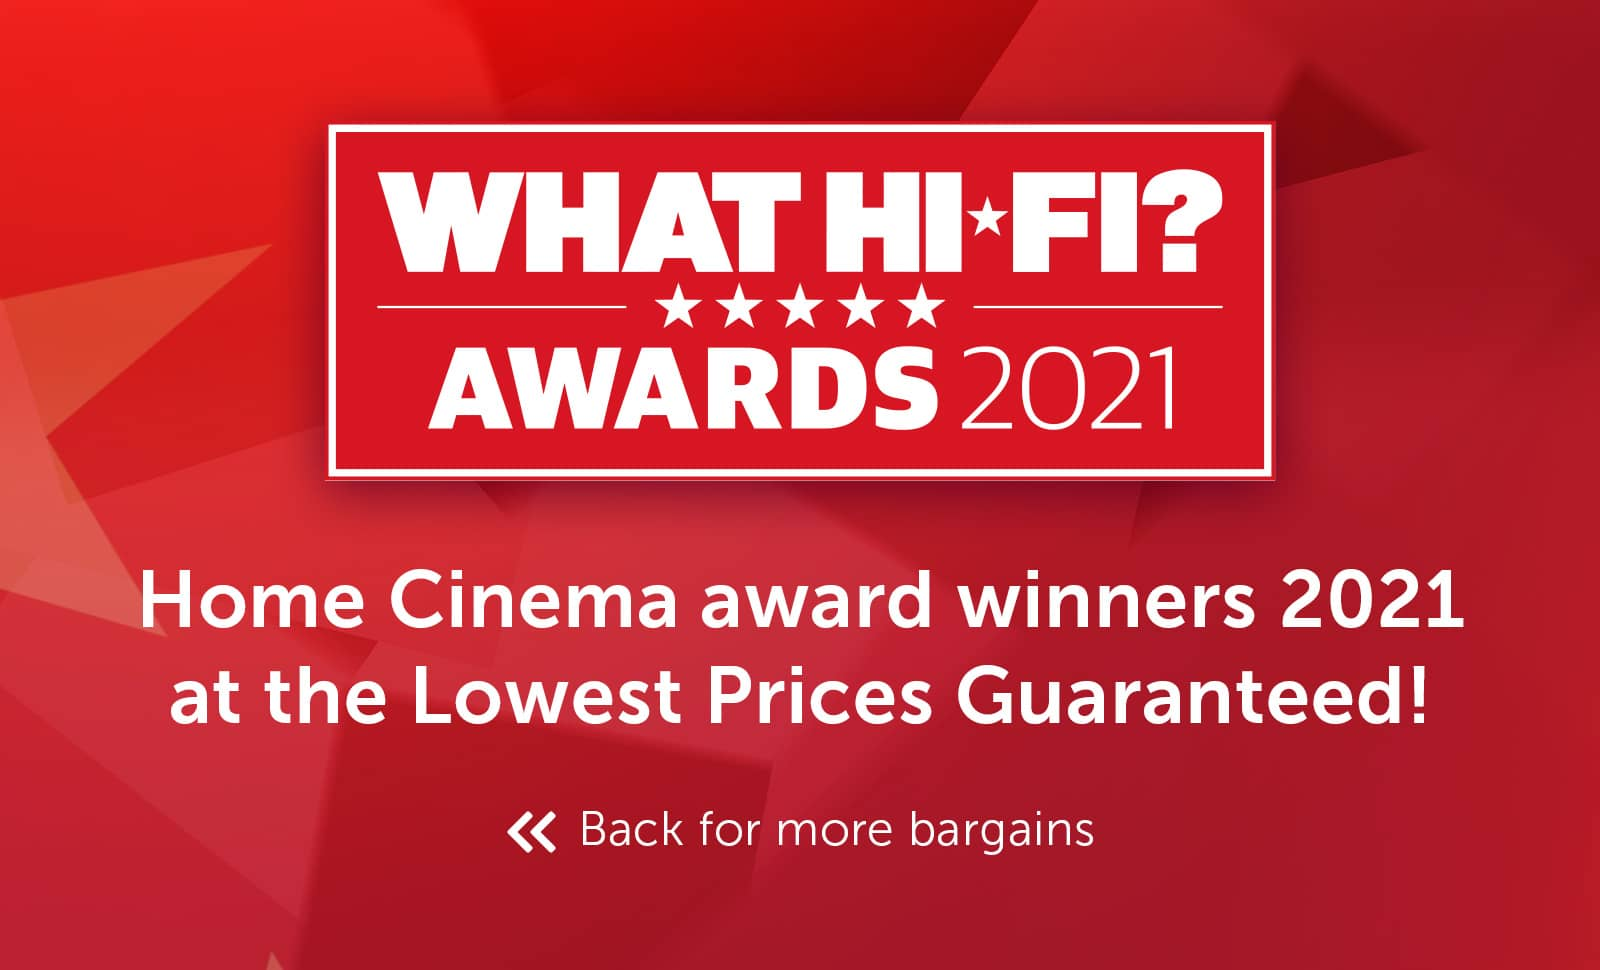 What Hi-Fi? Best Buy Awards 2021 - Home Cinema